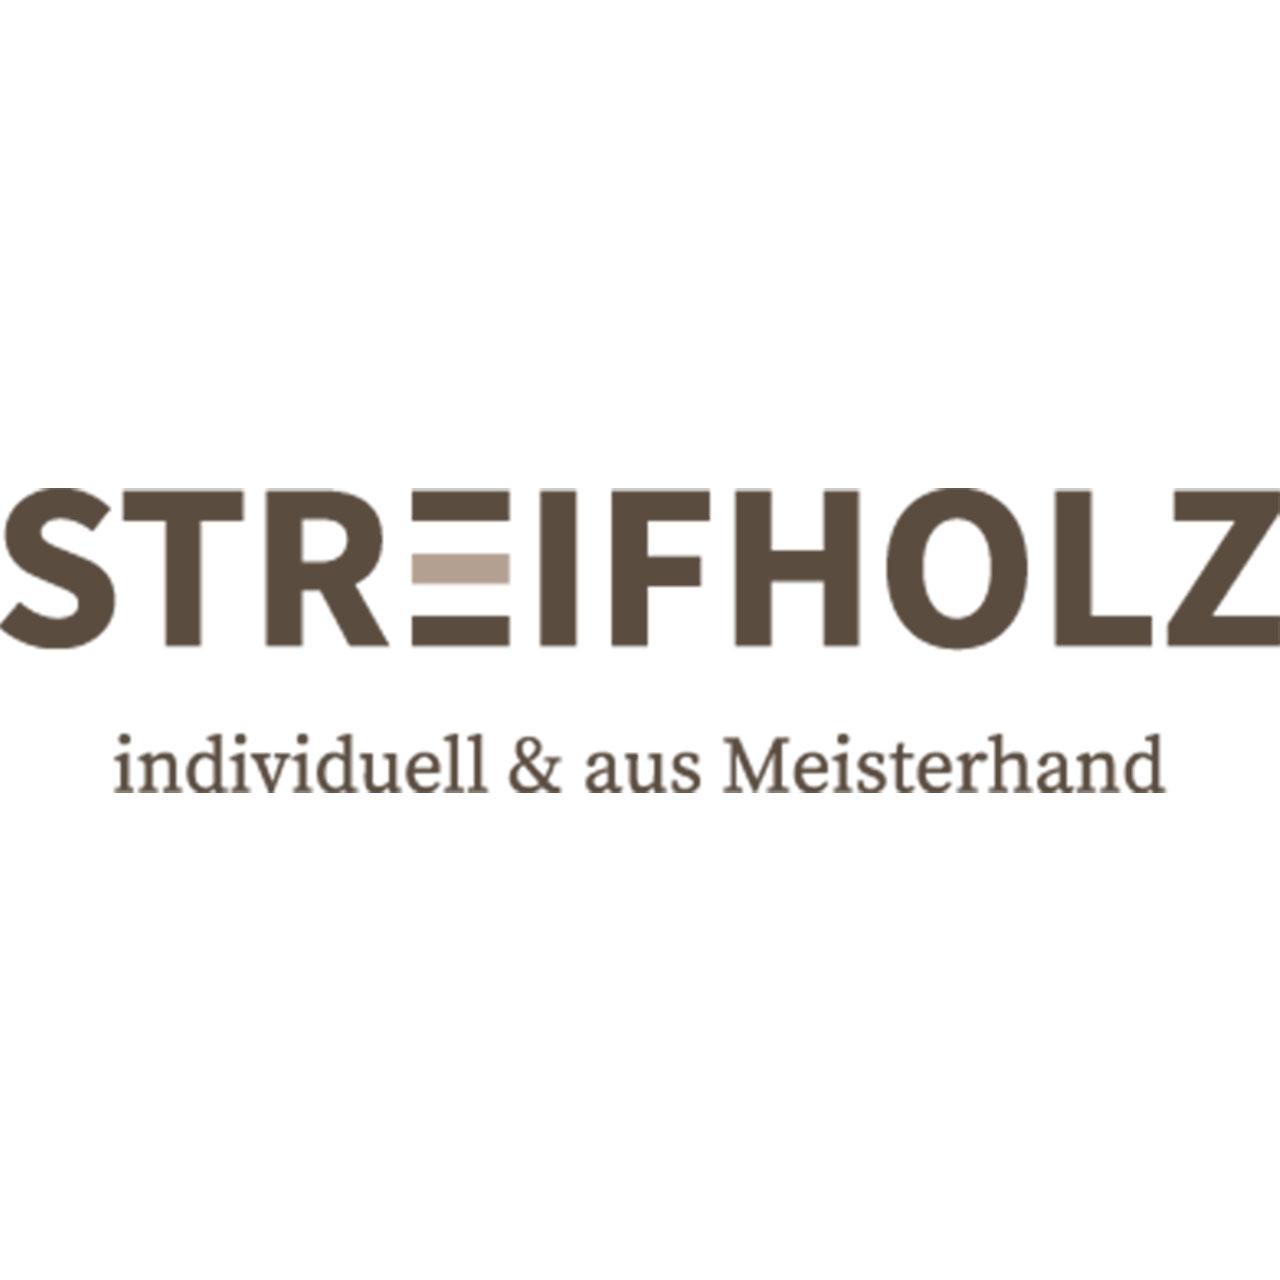 Streifholz